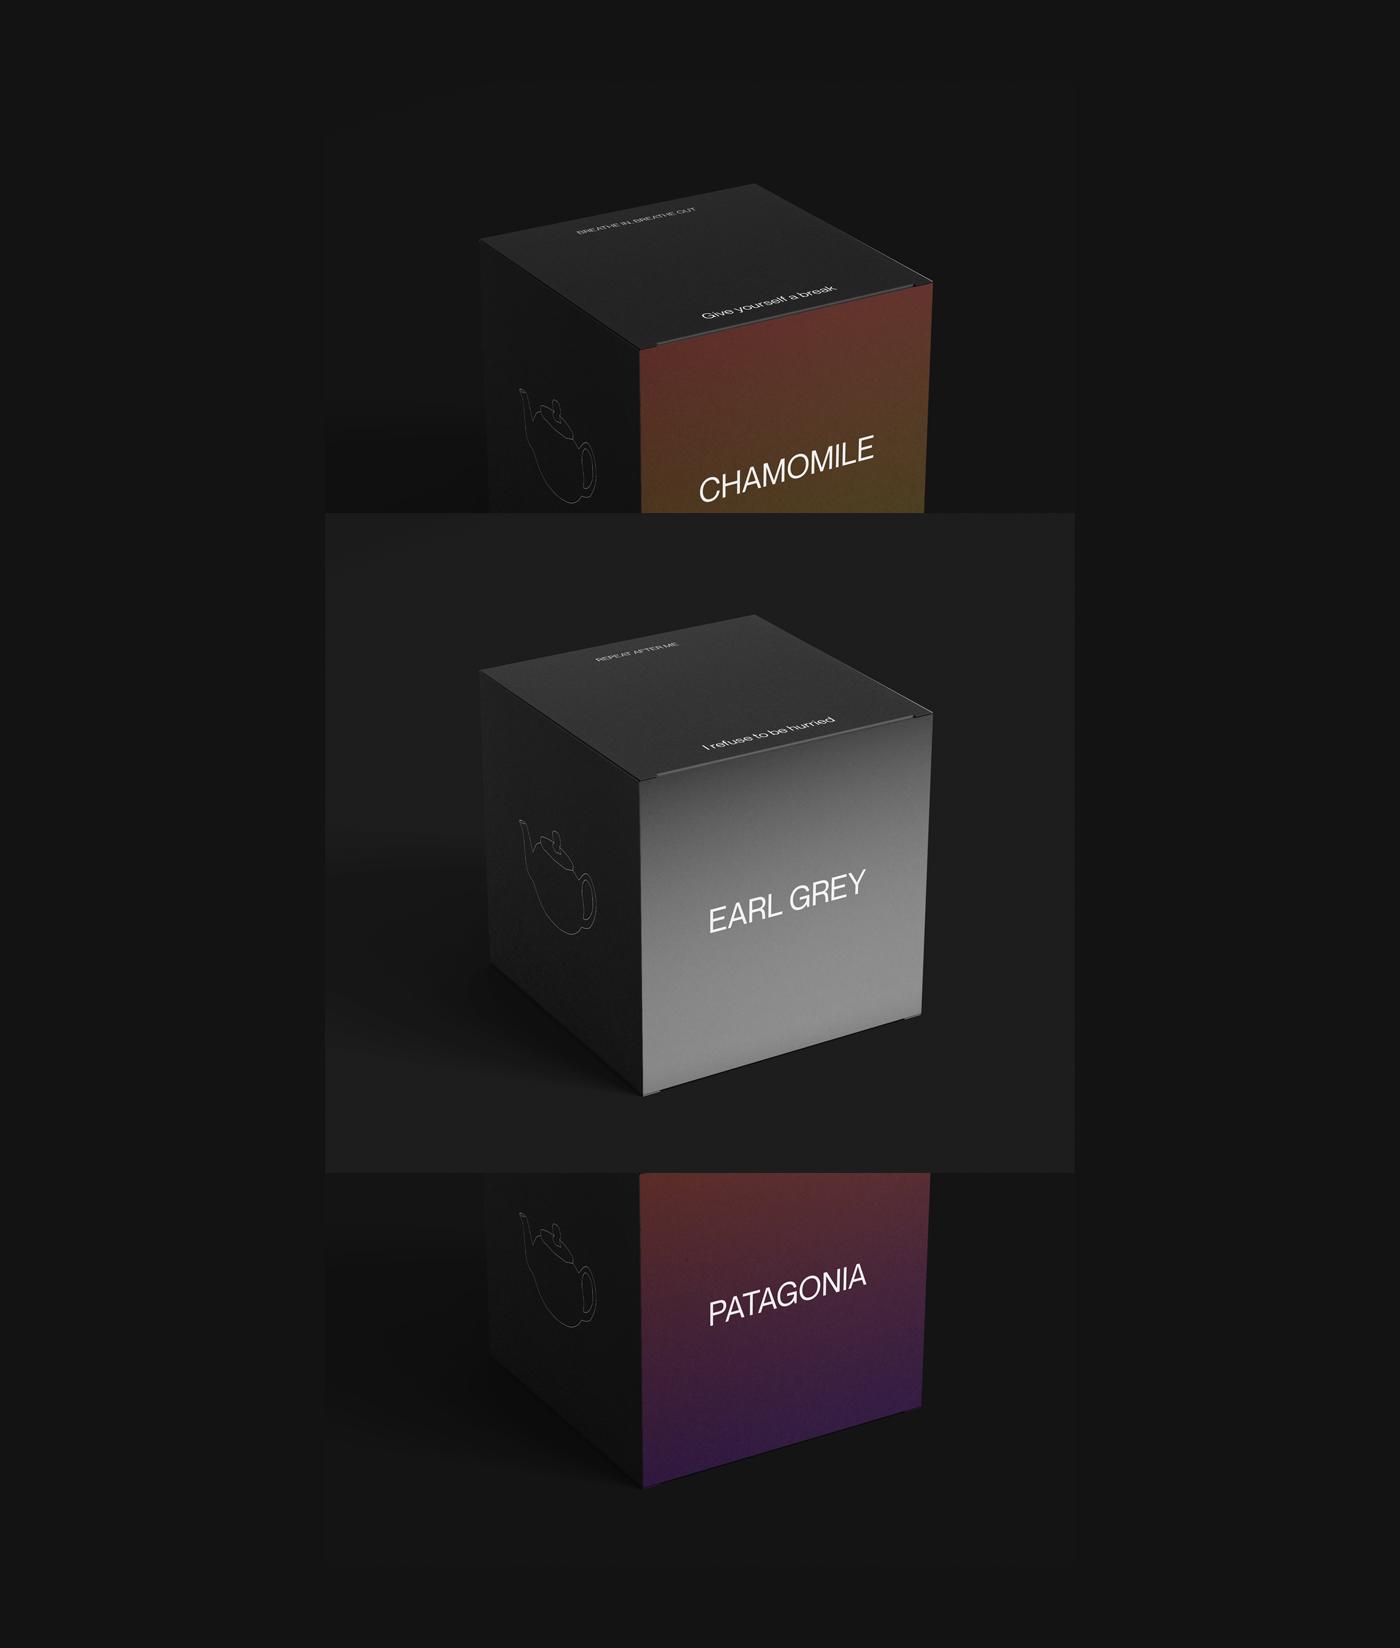 Tea boxes - Packaging design for Capital Tea. Concept work by Postdigitalist.